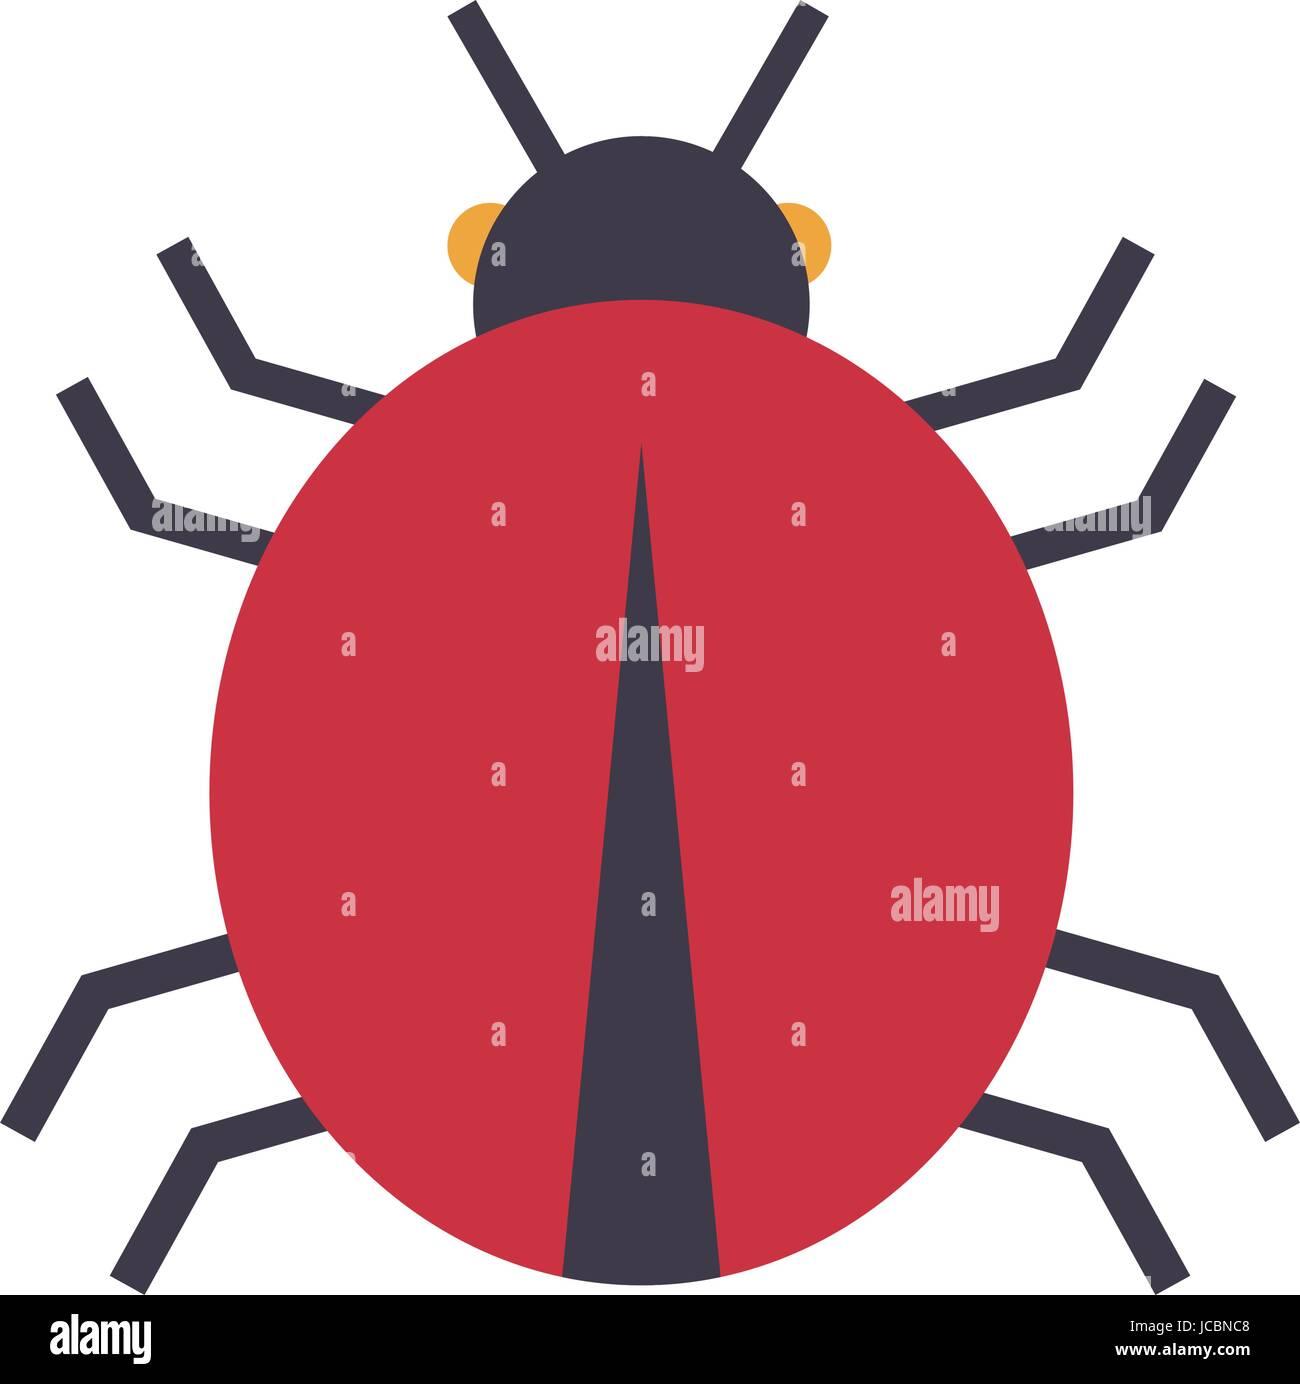 Cyber-Sicherheit Gefahr Malware Virus design Stockbild